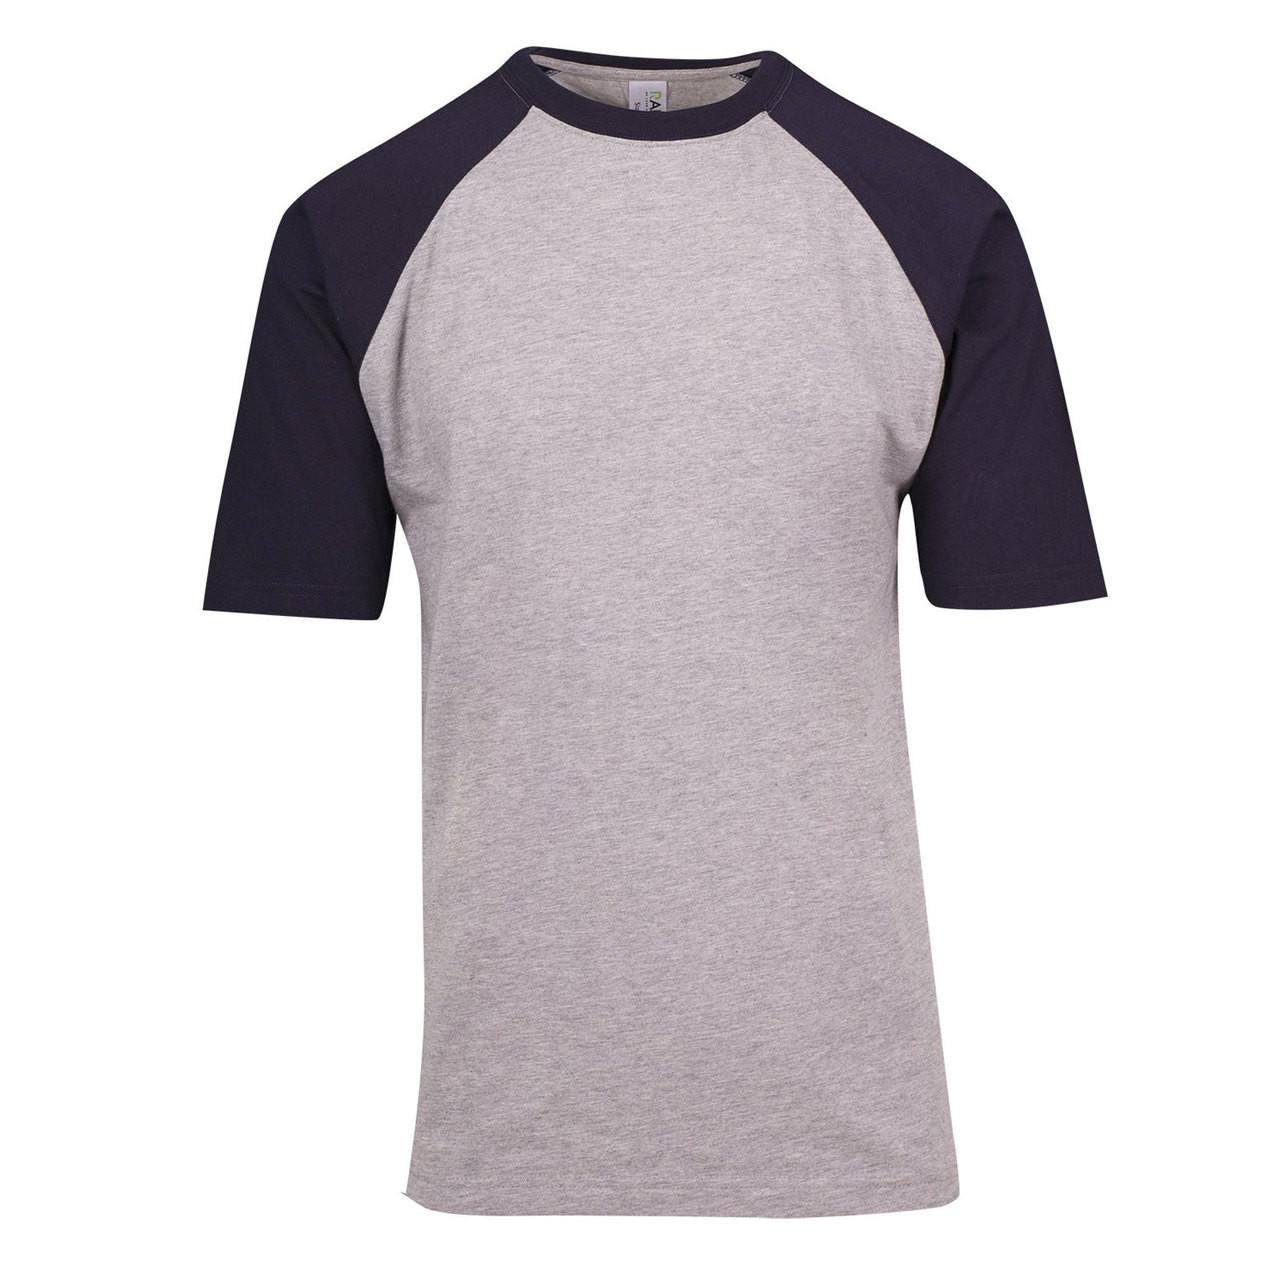 41c5f1a5 t-shirts raglan sleeves two-tone | plain tee shirts | discount ...